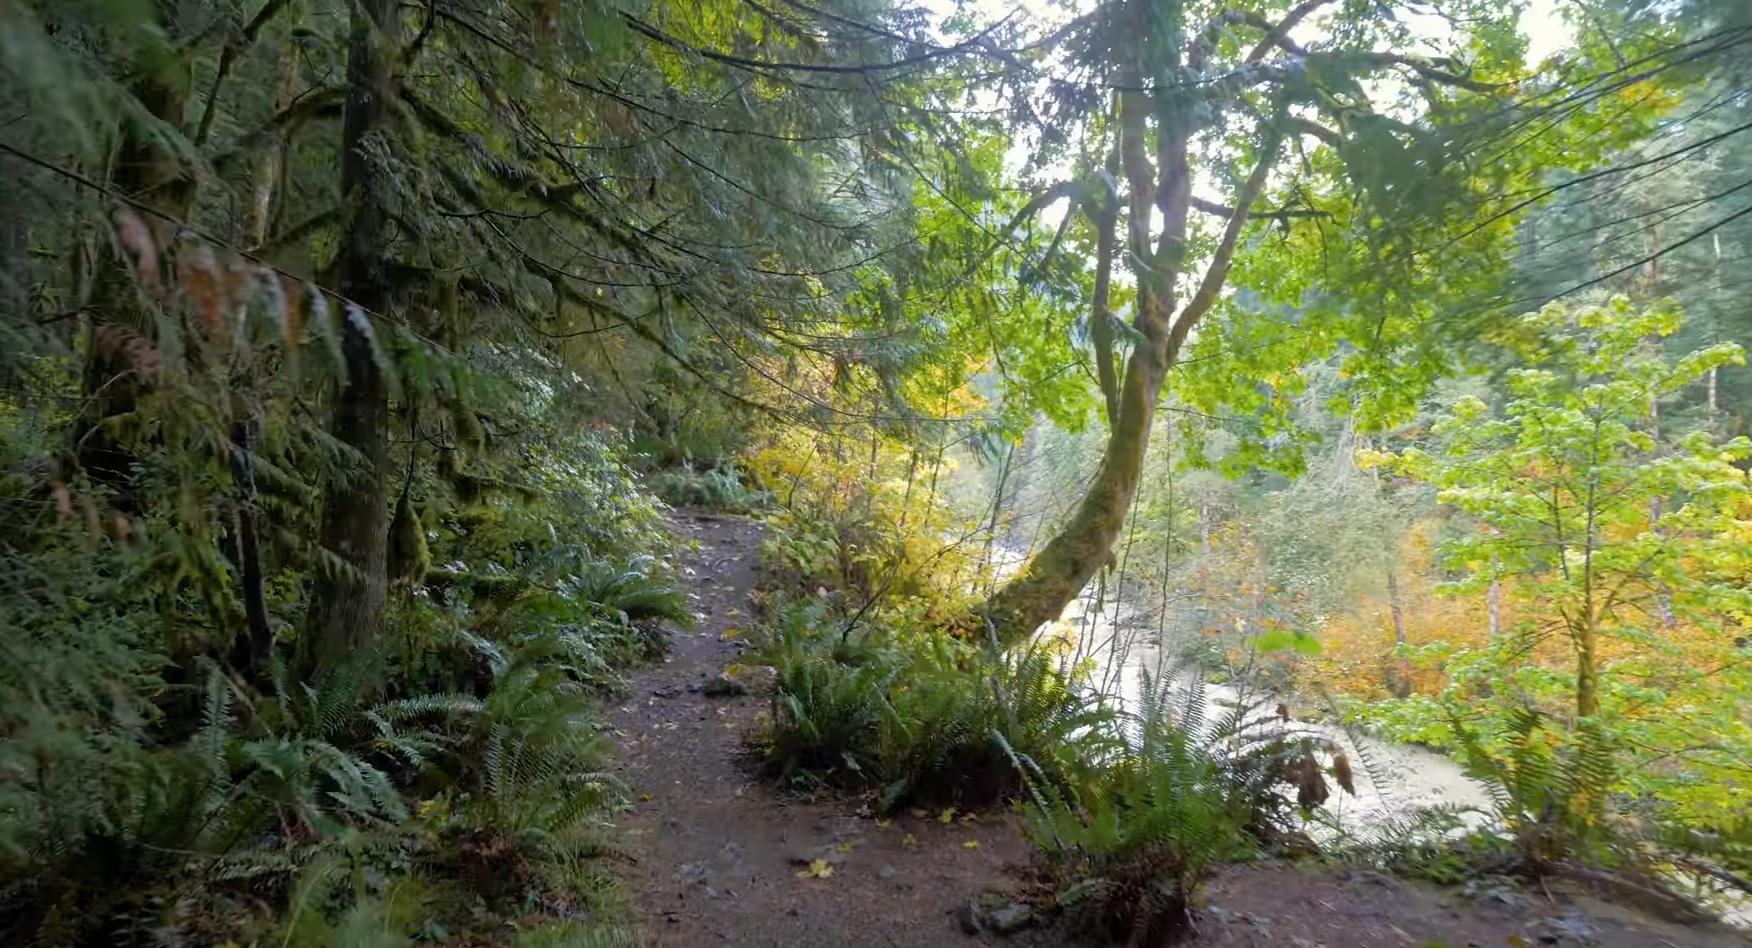 Relaxing Trail Walk In Autumn